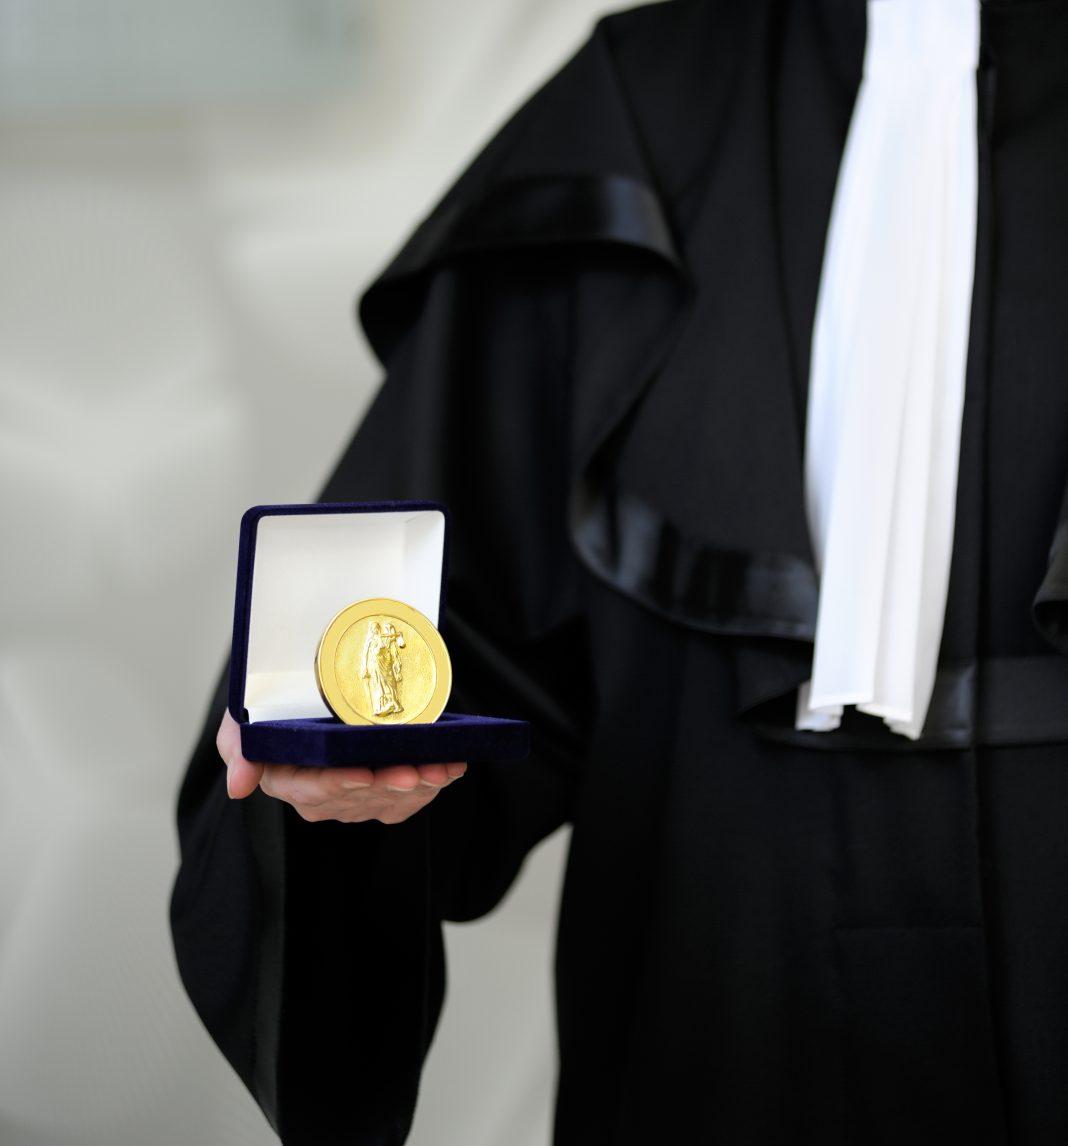 Justice award